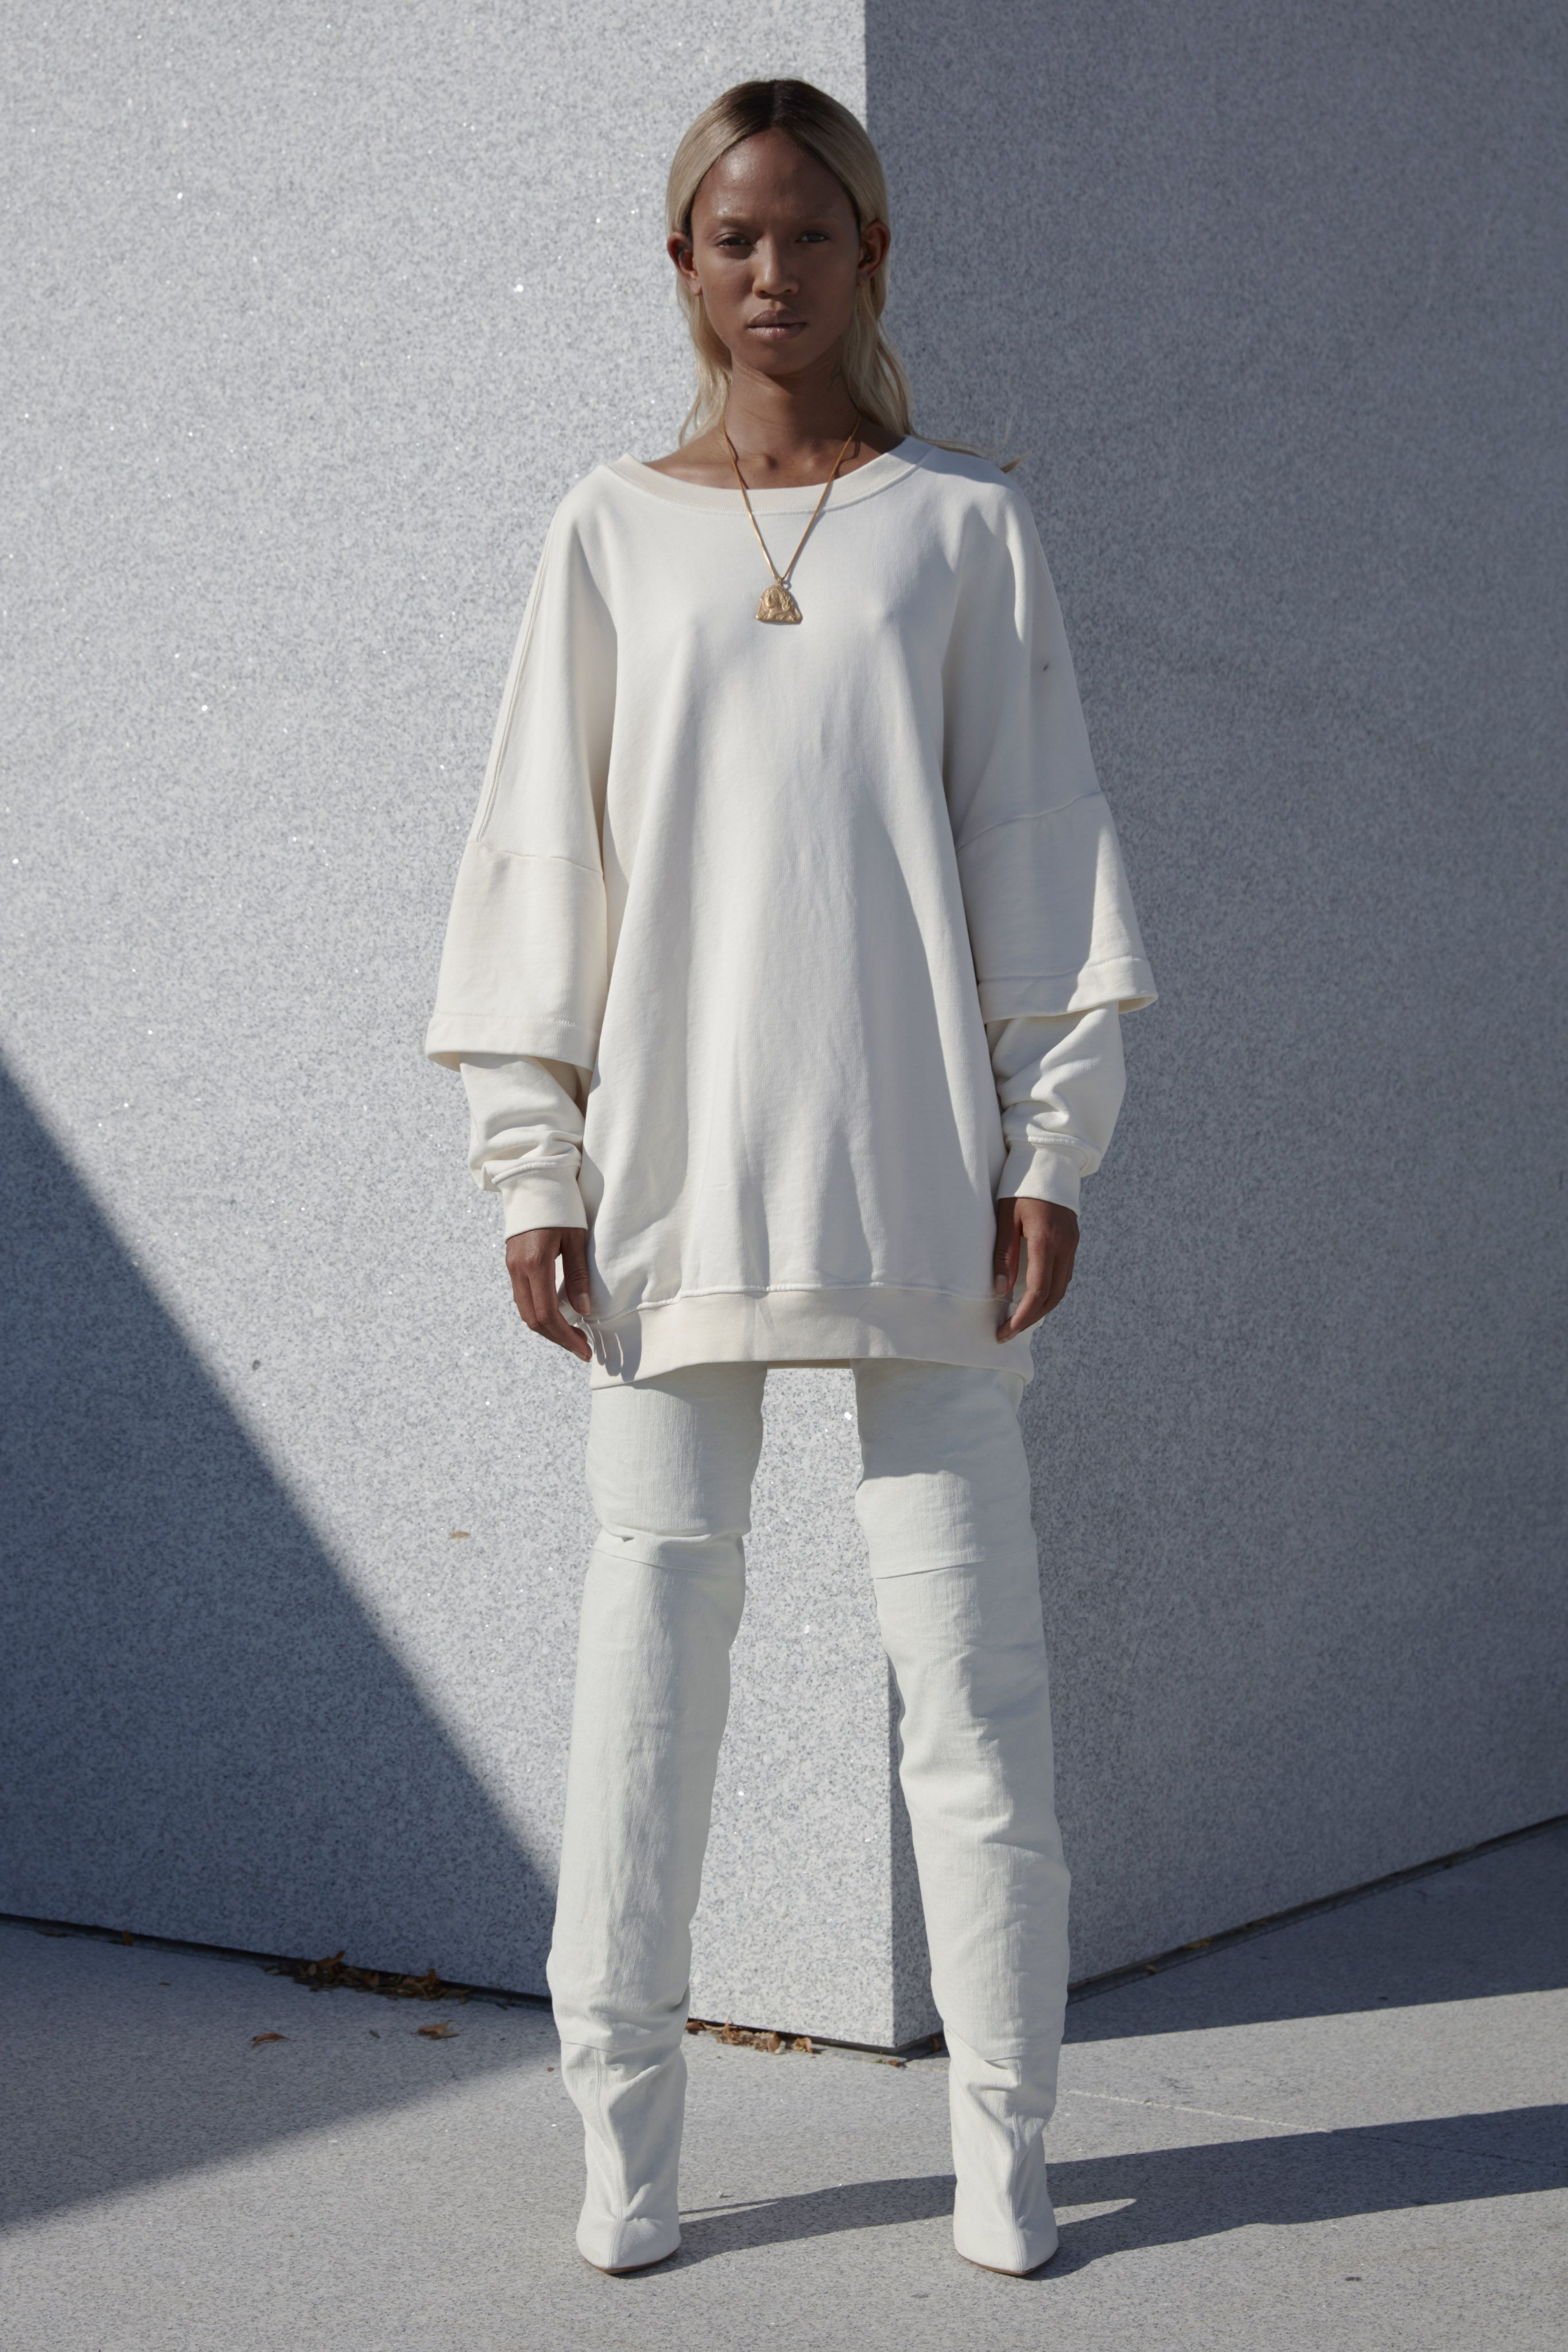 Yeezy Season 4 Yeezy Fashion Yeezy Outfit Fashion